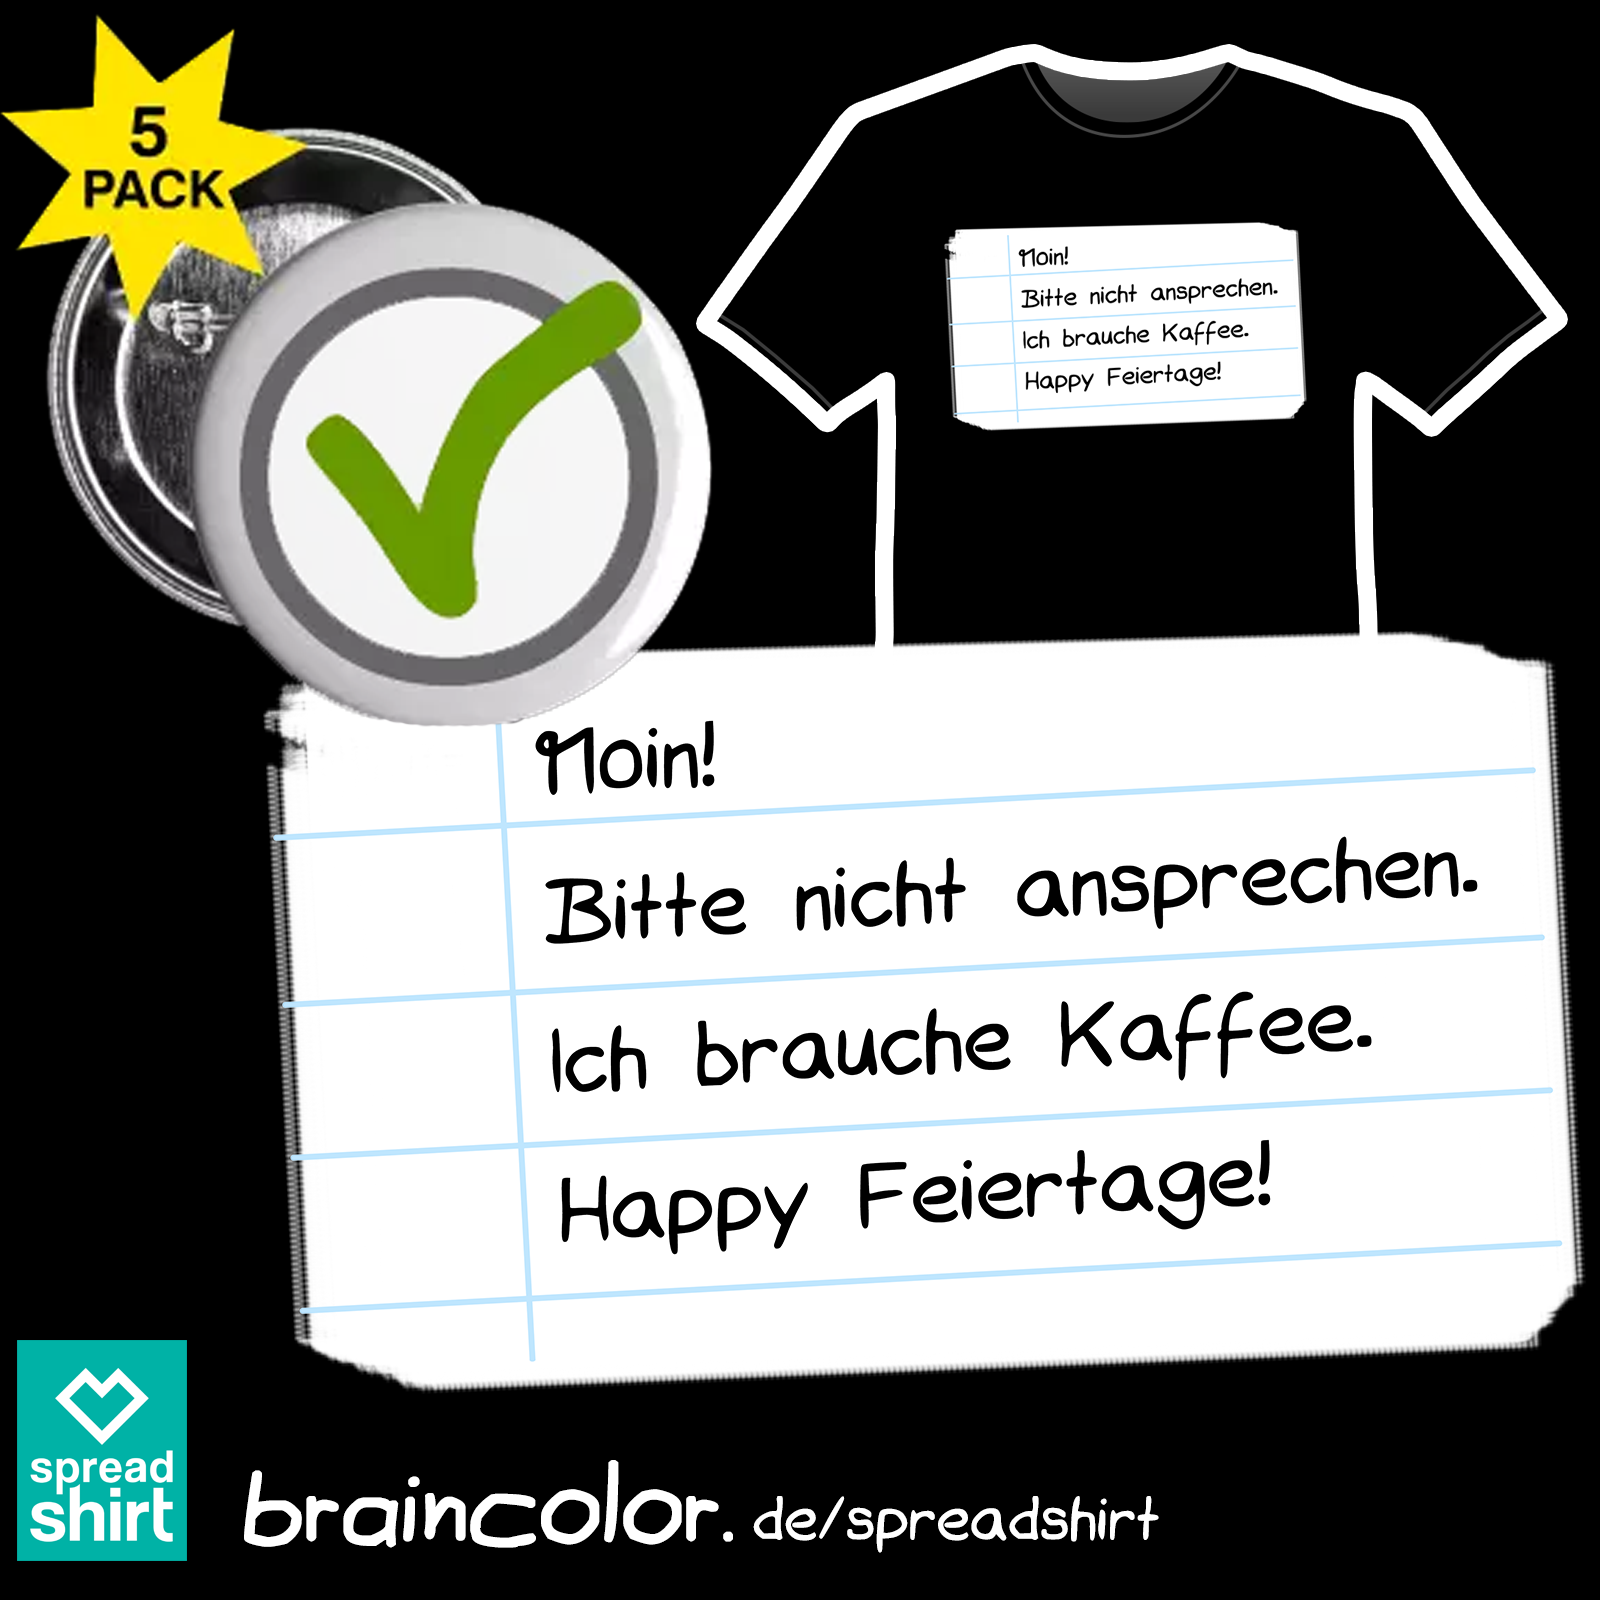 braincolor bei Spreadshirt